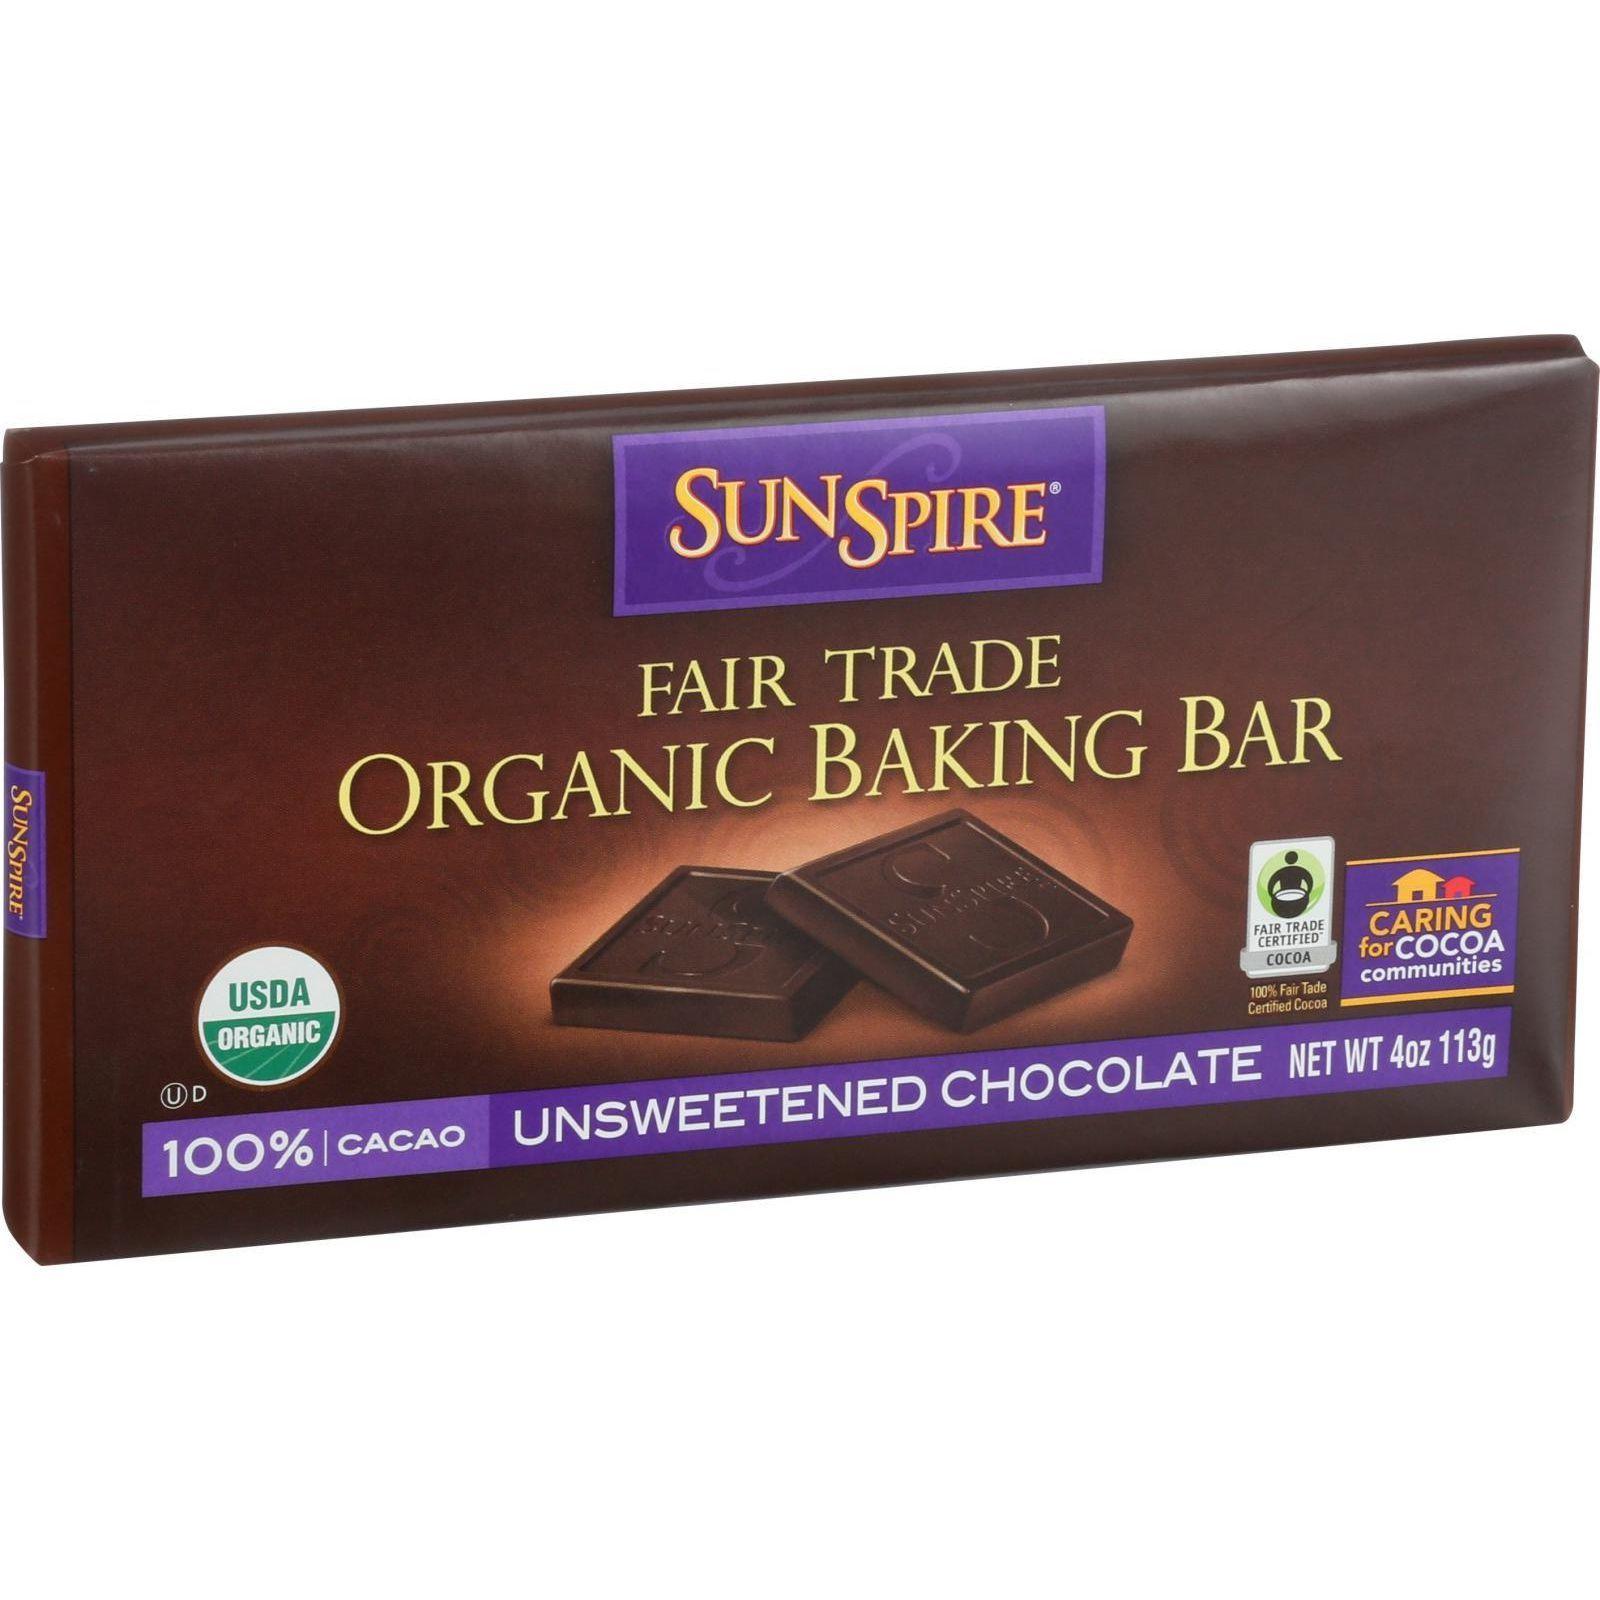 SunSpire Foods Baking Bar - Organic - Fair Trade - 100 Percent Cocoa - 4 oz Bars - Case of 12